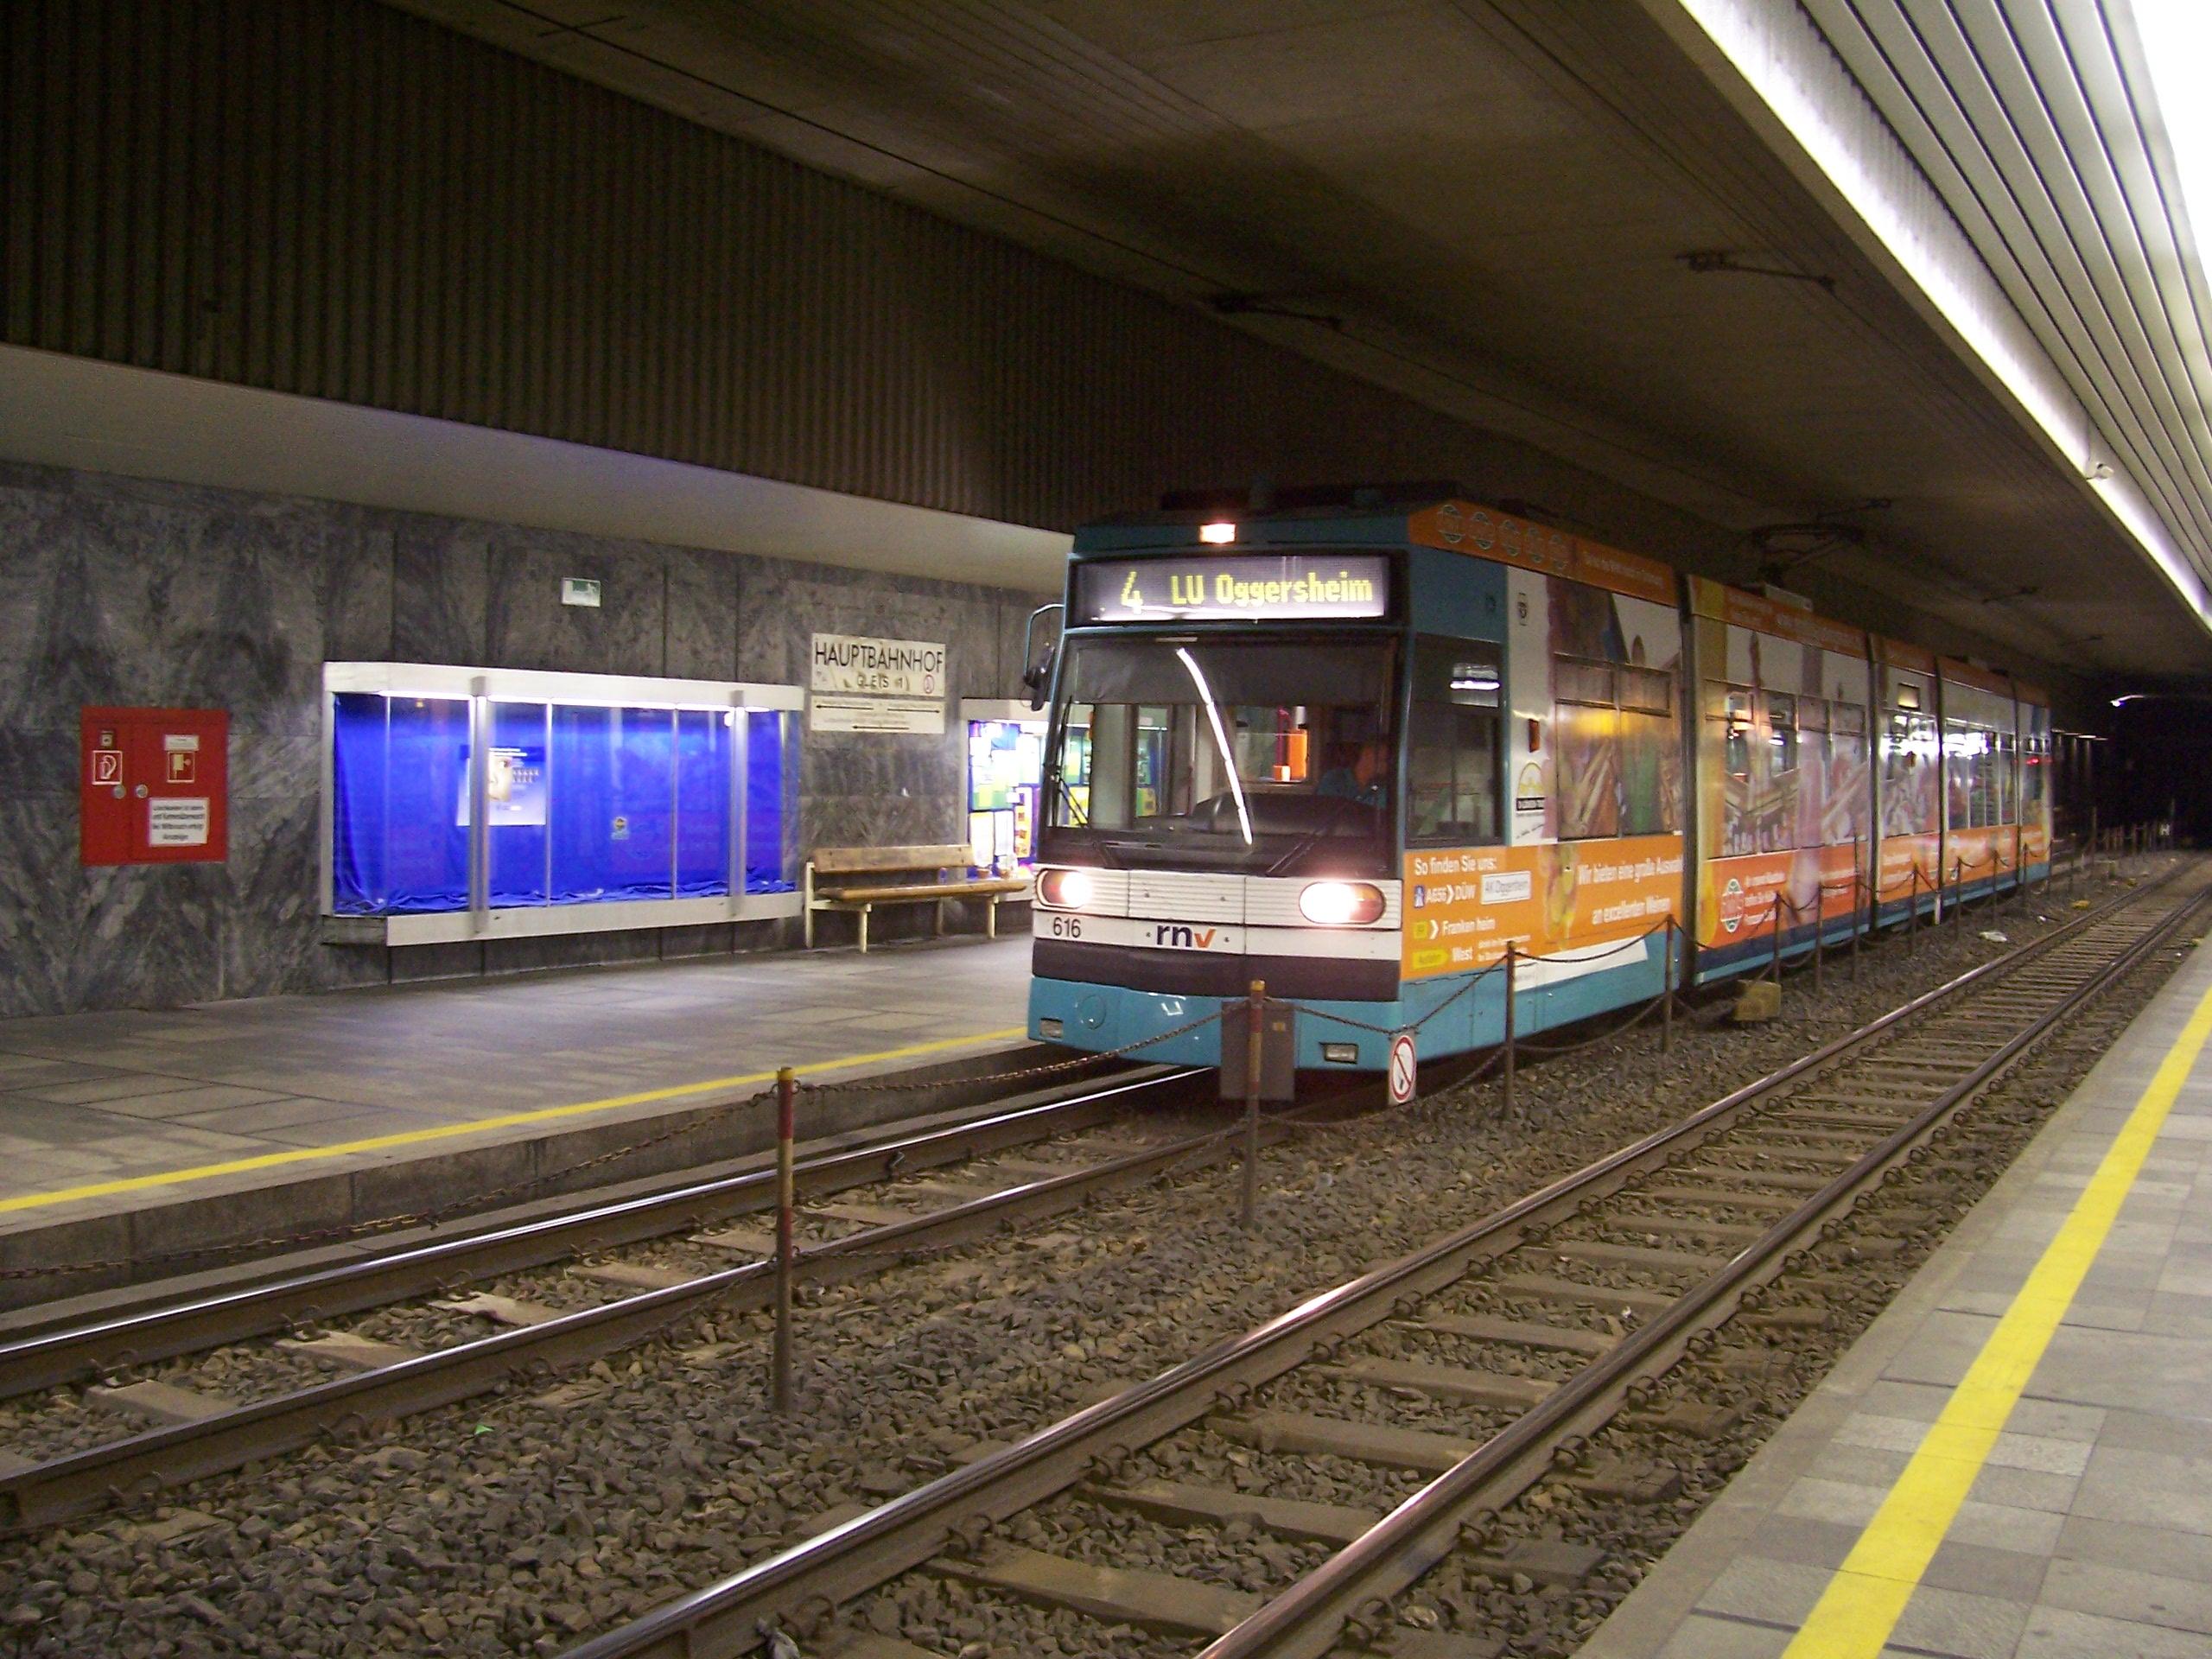 U-Strassenbahn Haltestelle Ludwigshafen Hauptbahnhof 100 7065.jpg